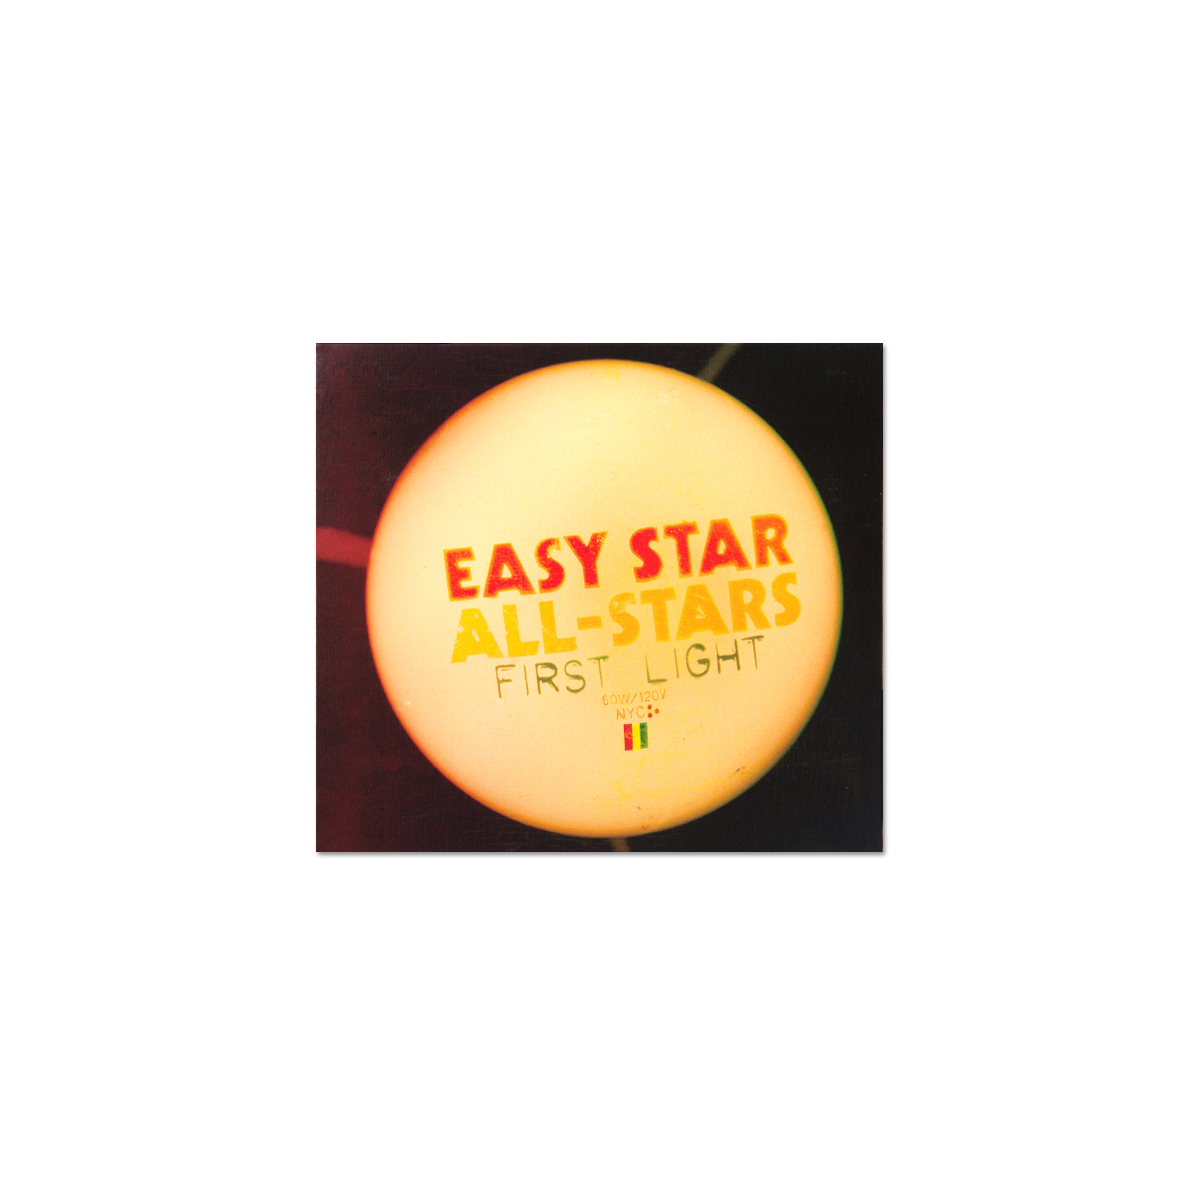 Easy Star All-Stars - First Light Digital Download